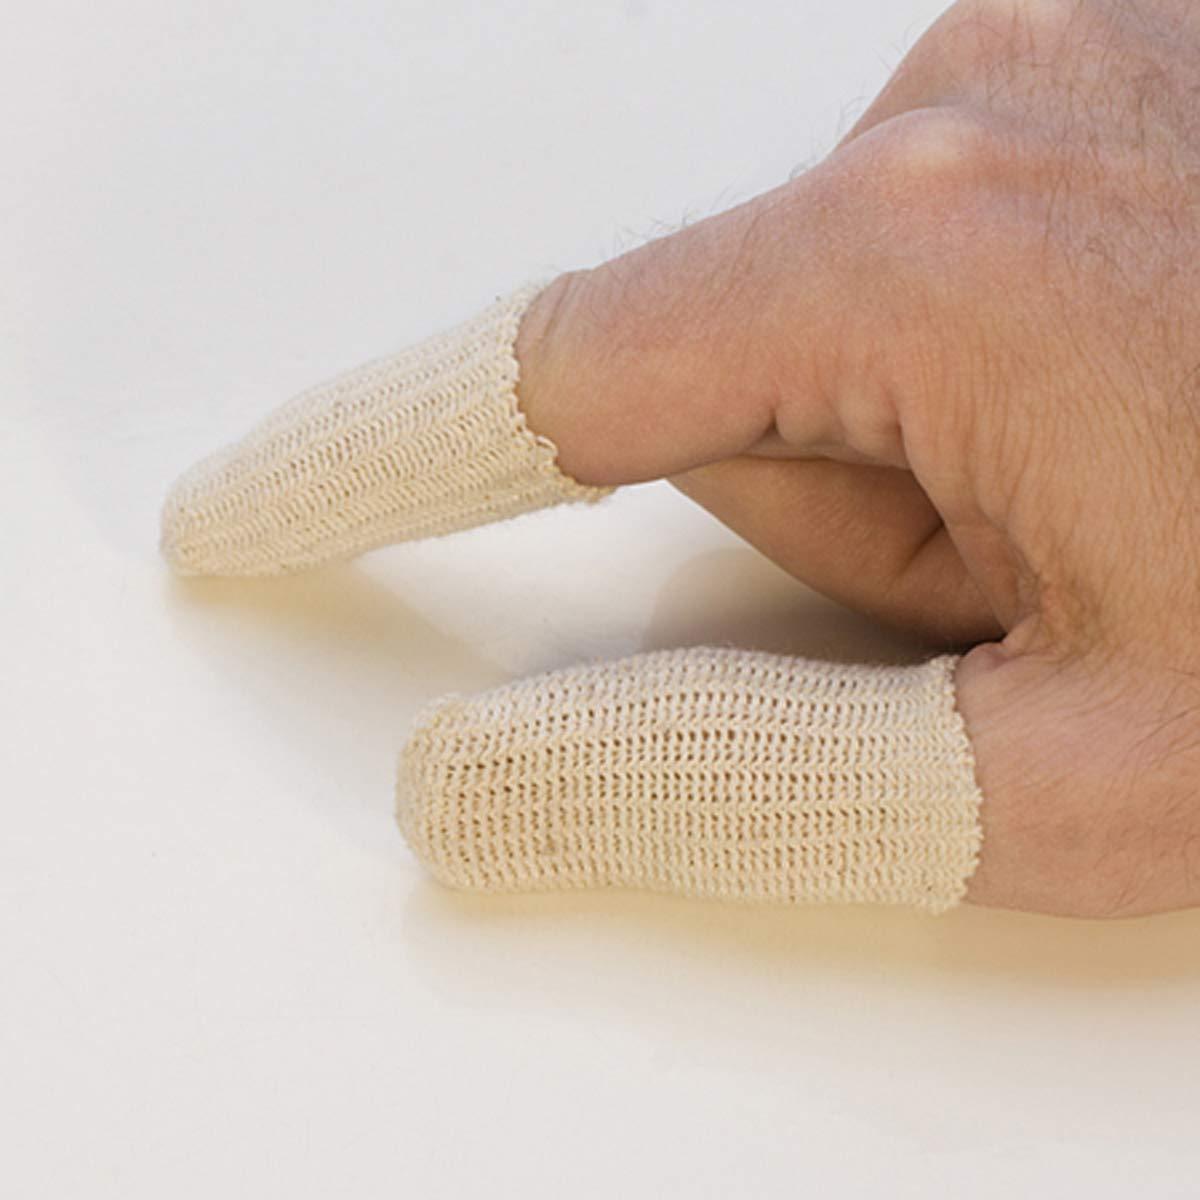 EuroTool Cotton Finger Guards (Pkg of 20), POL-220.00